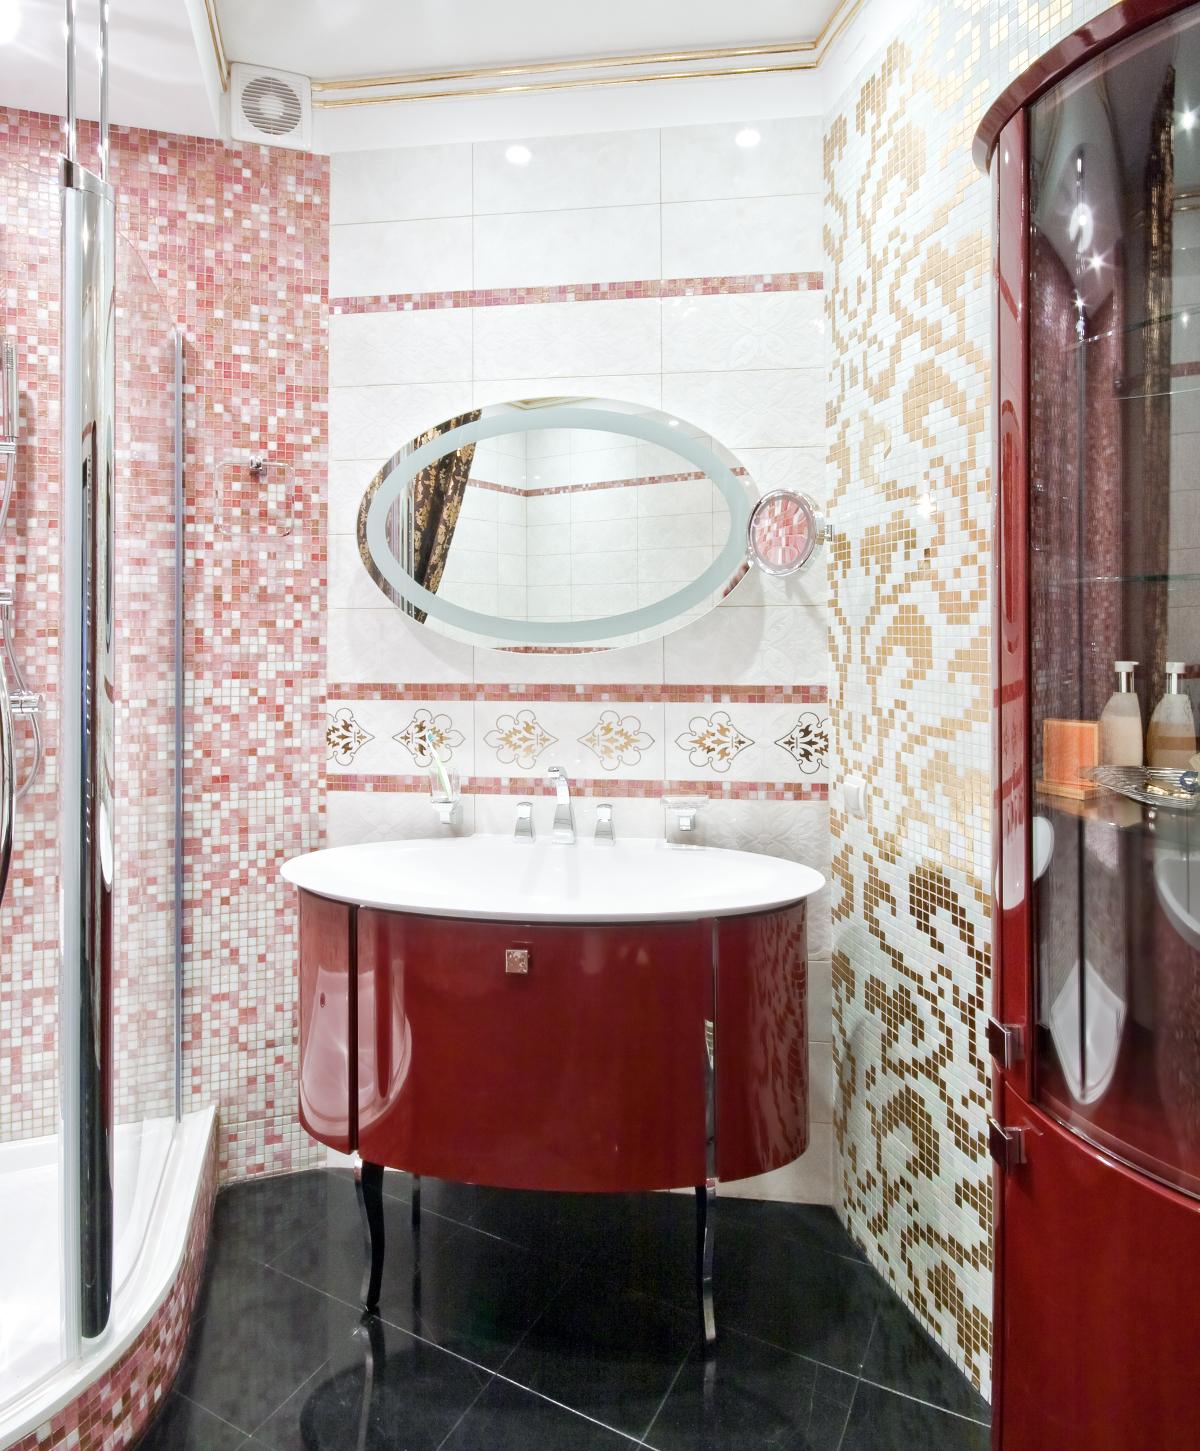 Bathrooms that Beckon - Living Magazine